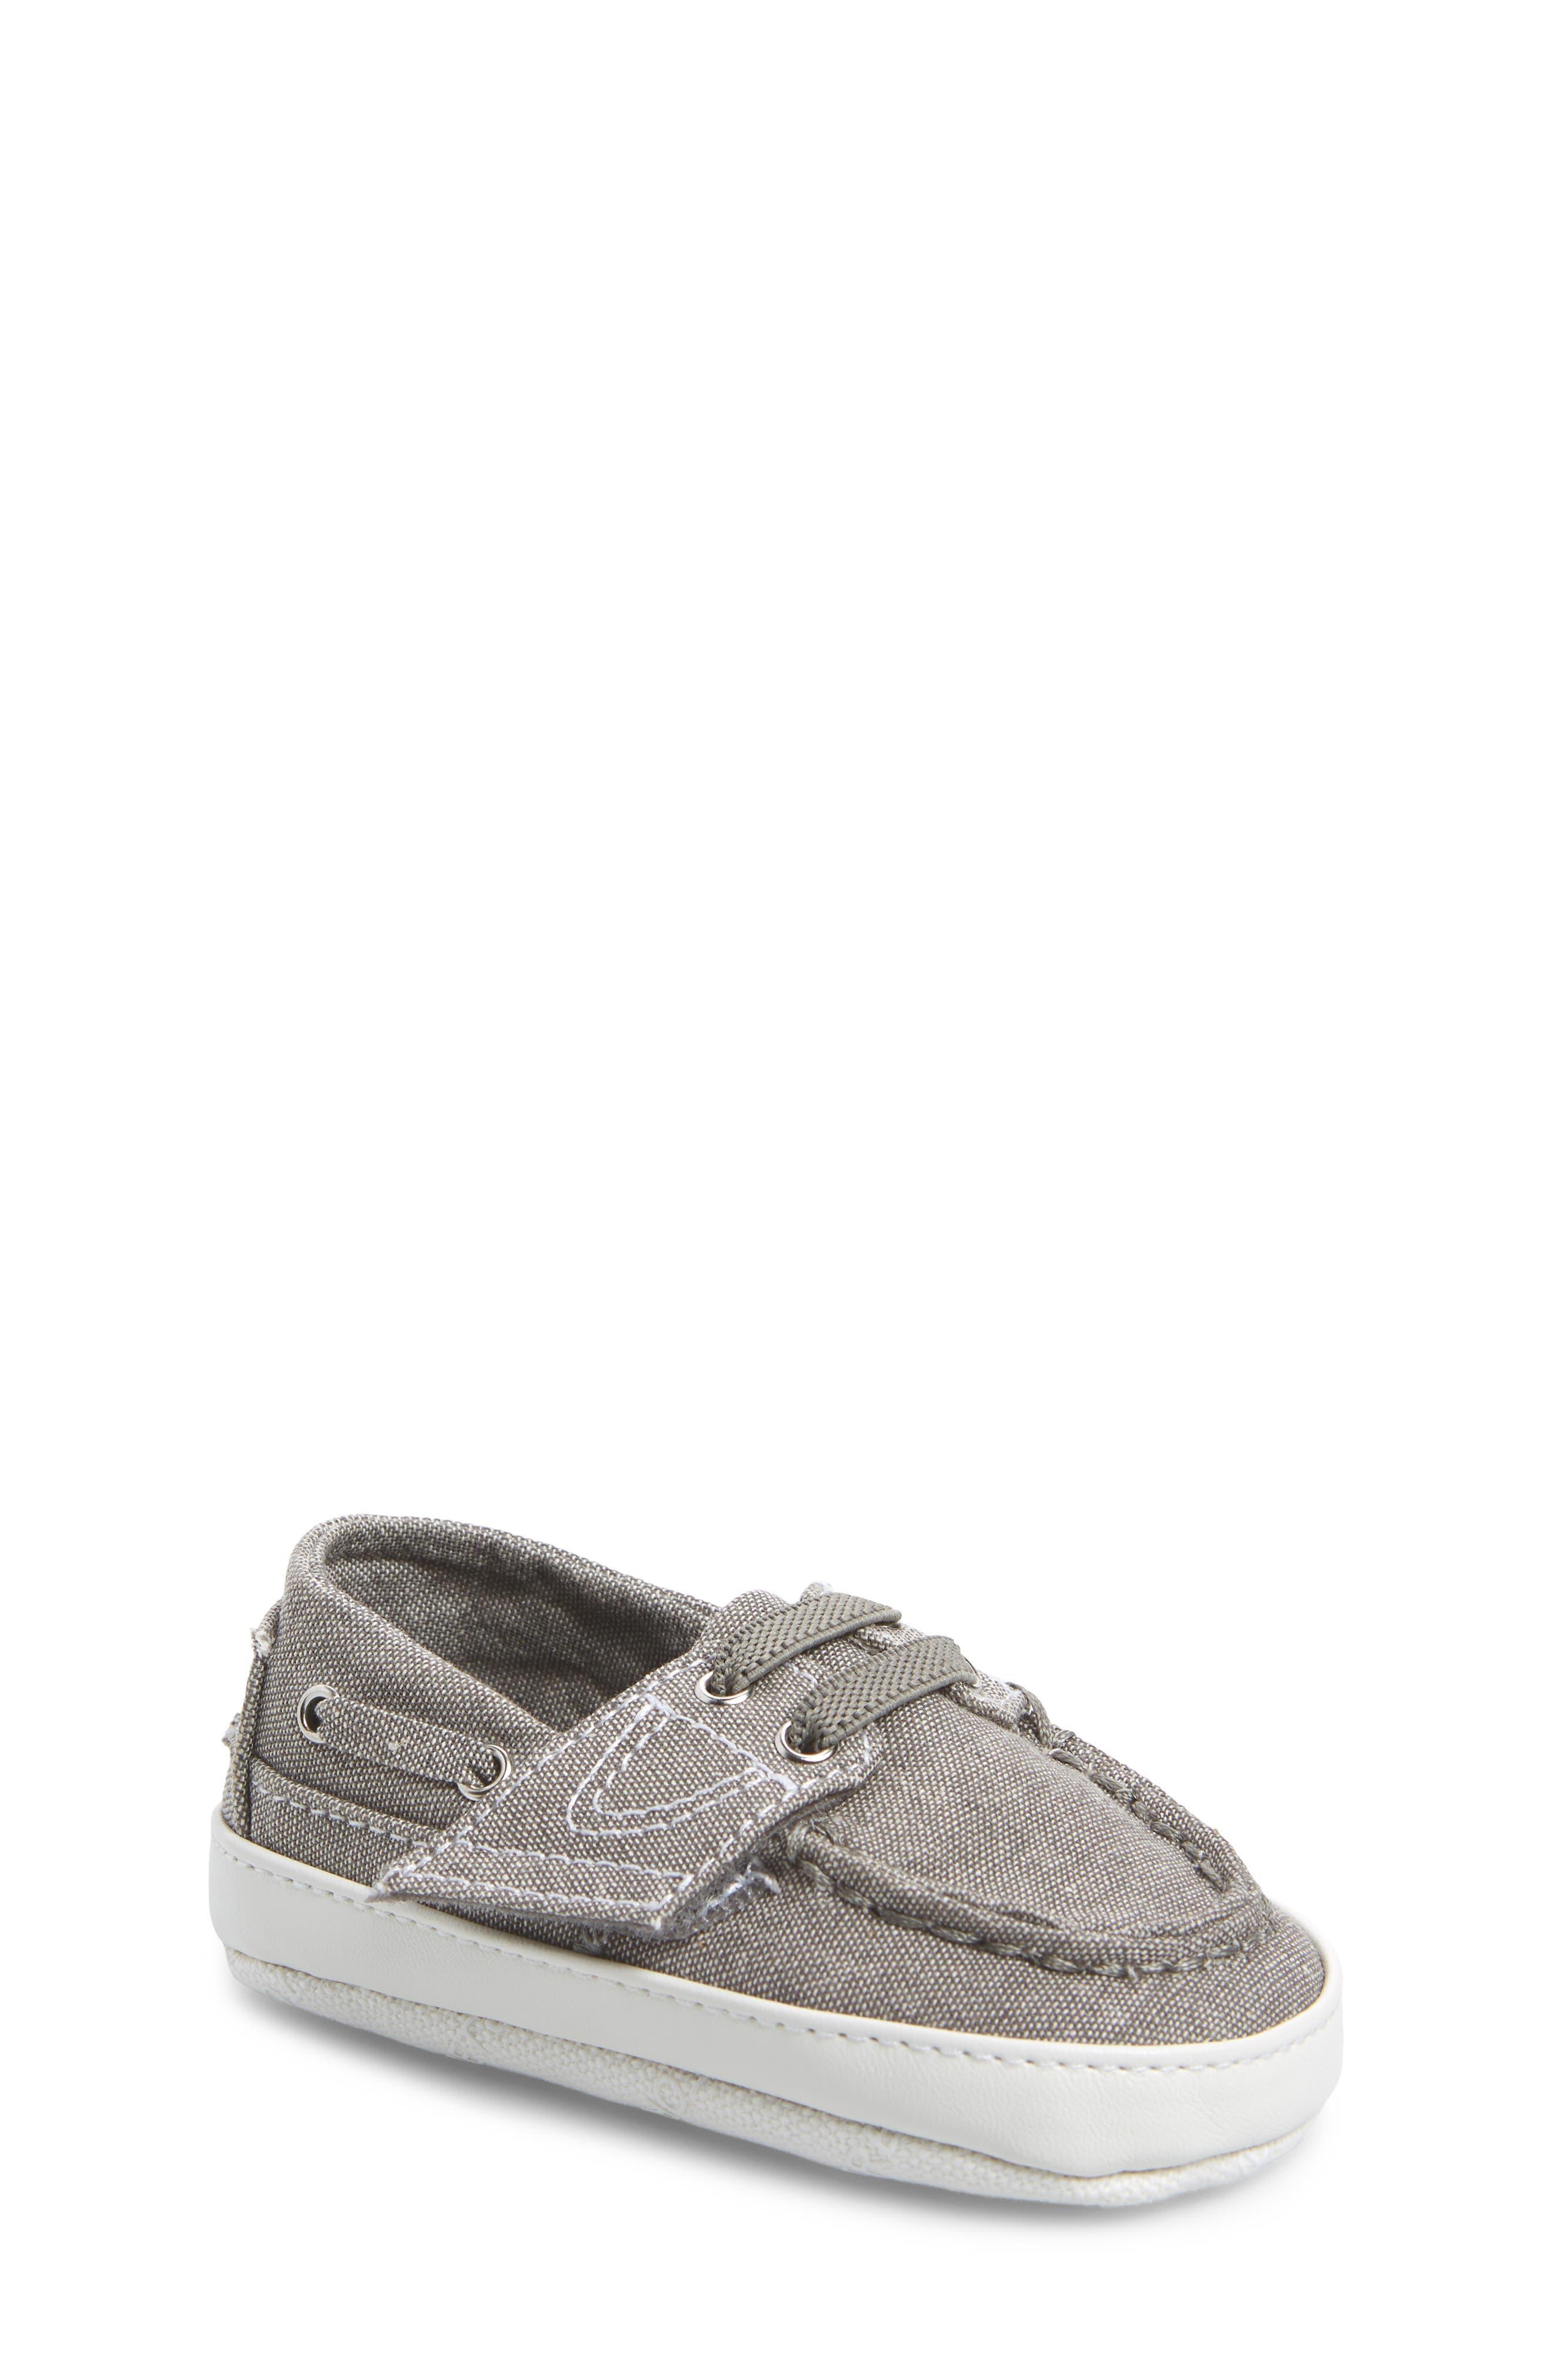 Tretorn Motto Boat Crib Shoe (Baby)